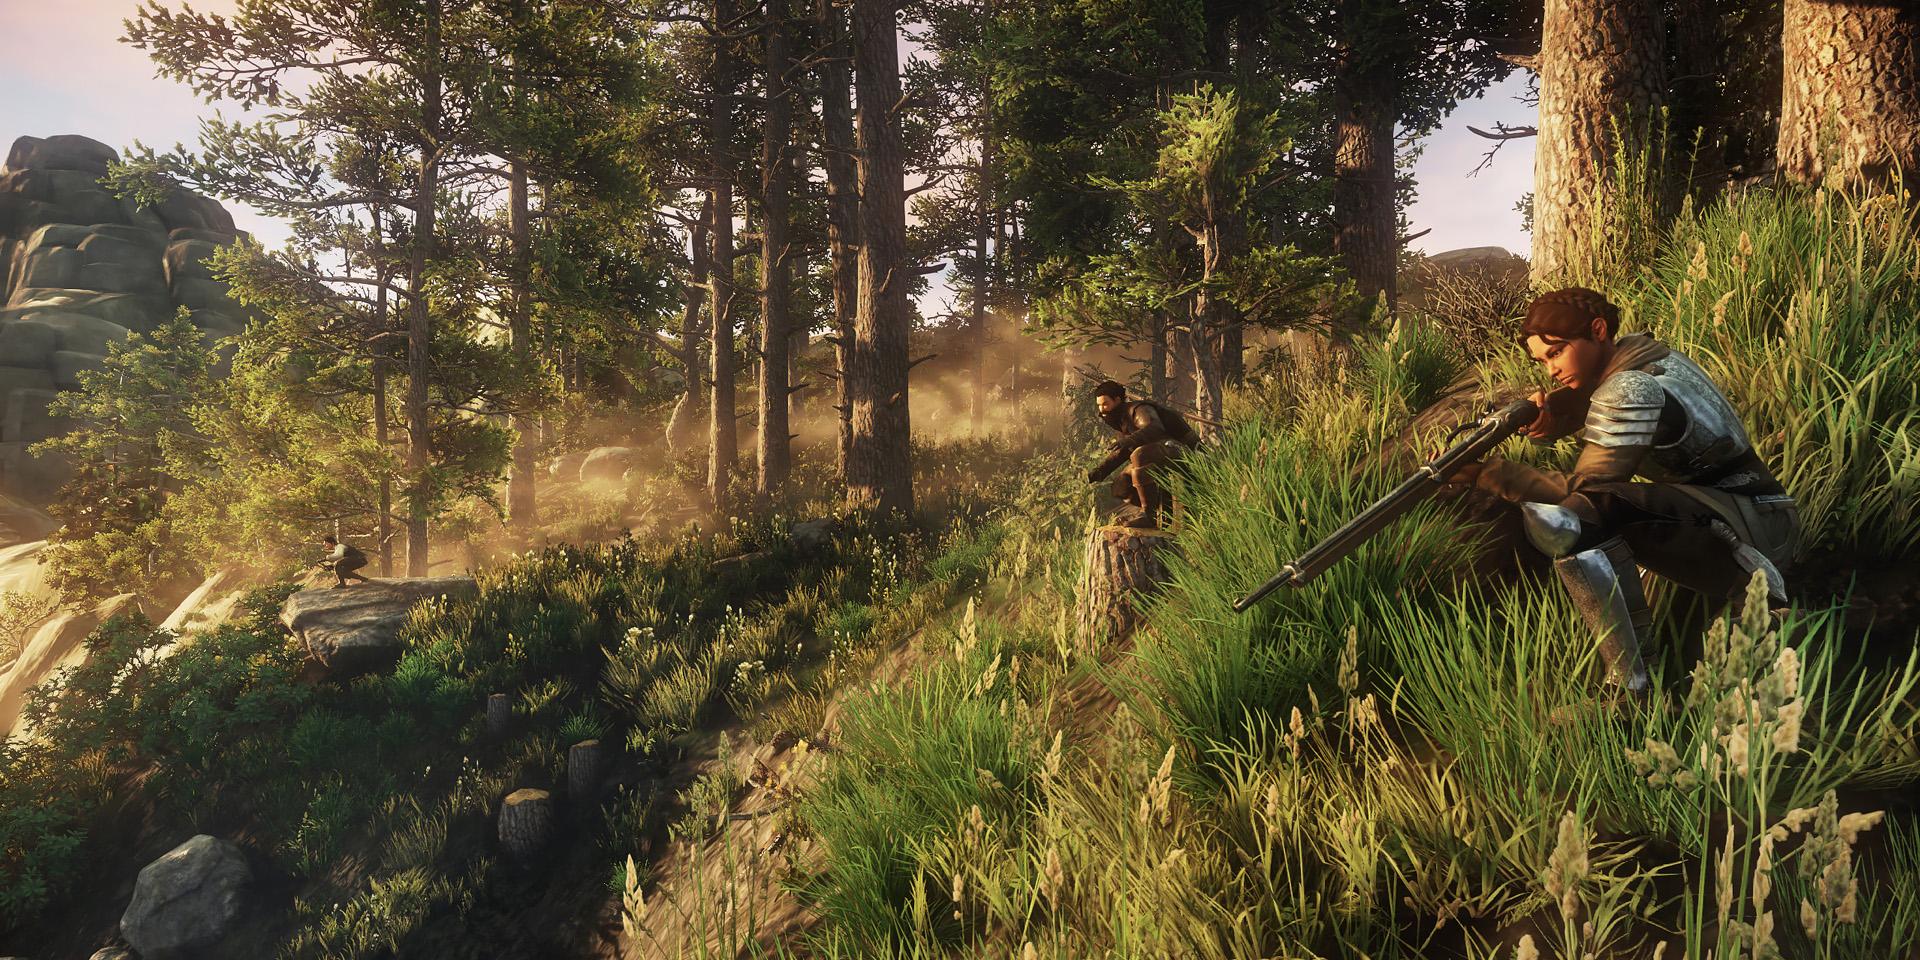 New World: Охотники без дичи: больше никаких PvE-бонусов при включении PvP-флага?